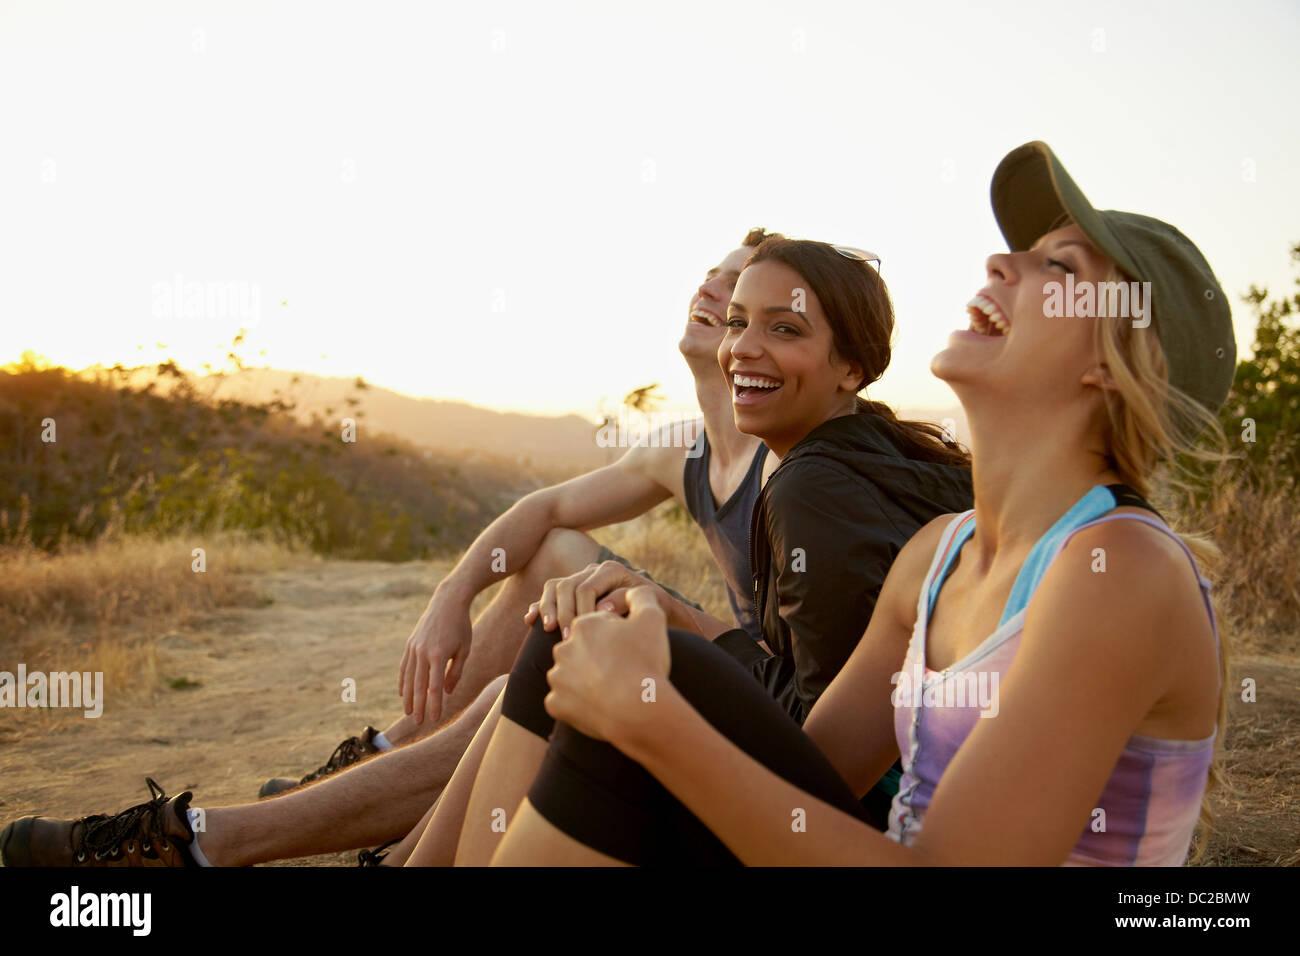 Friends enjoying hillside - Stock Image